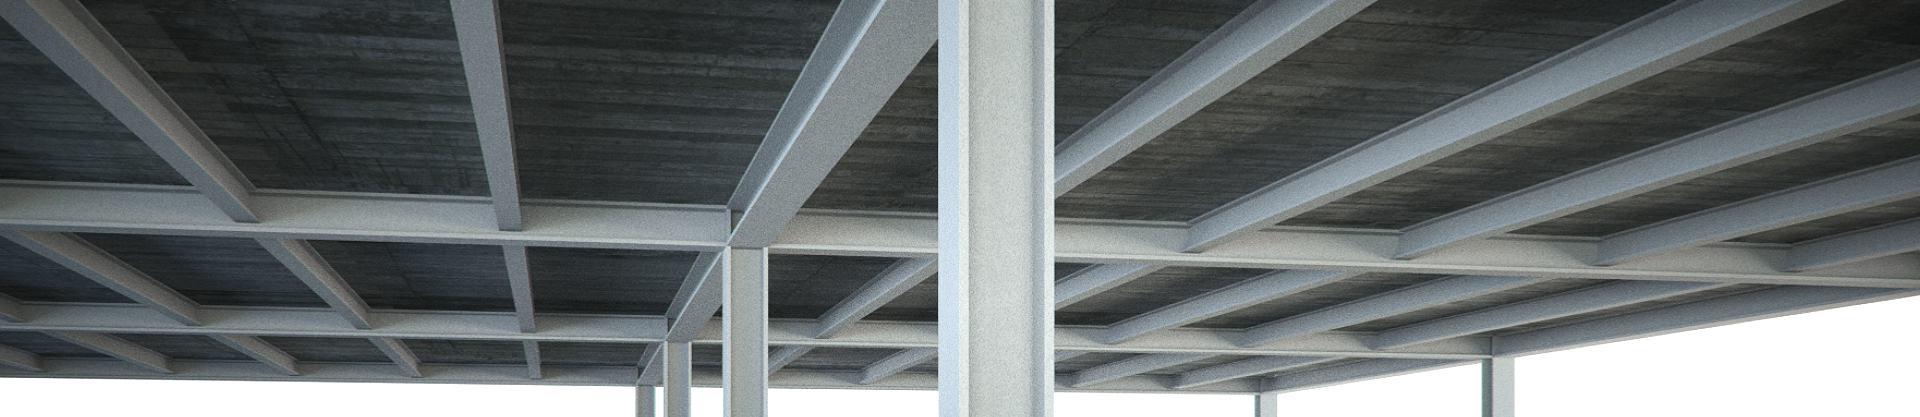 Ignifugado de estructuras metalicas